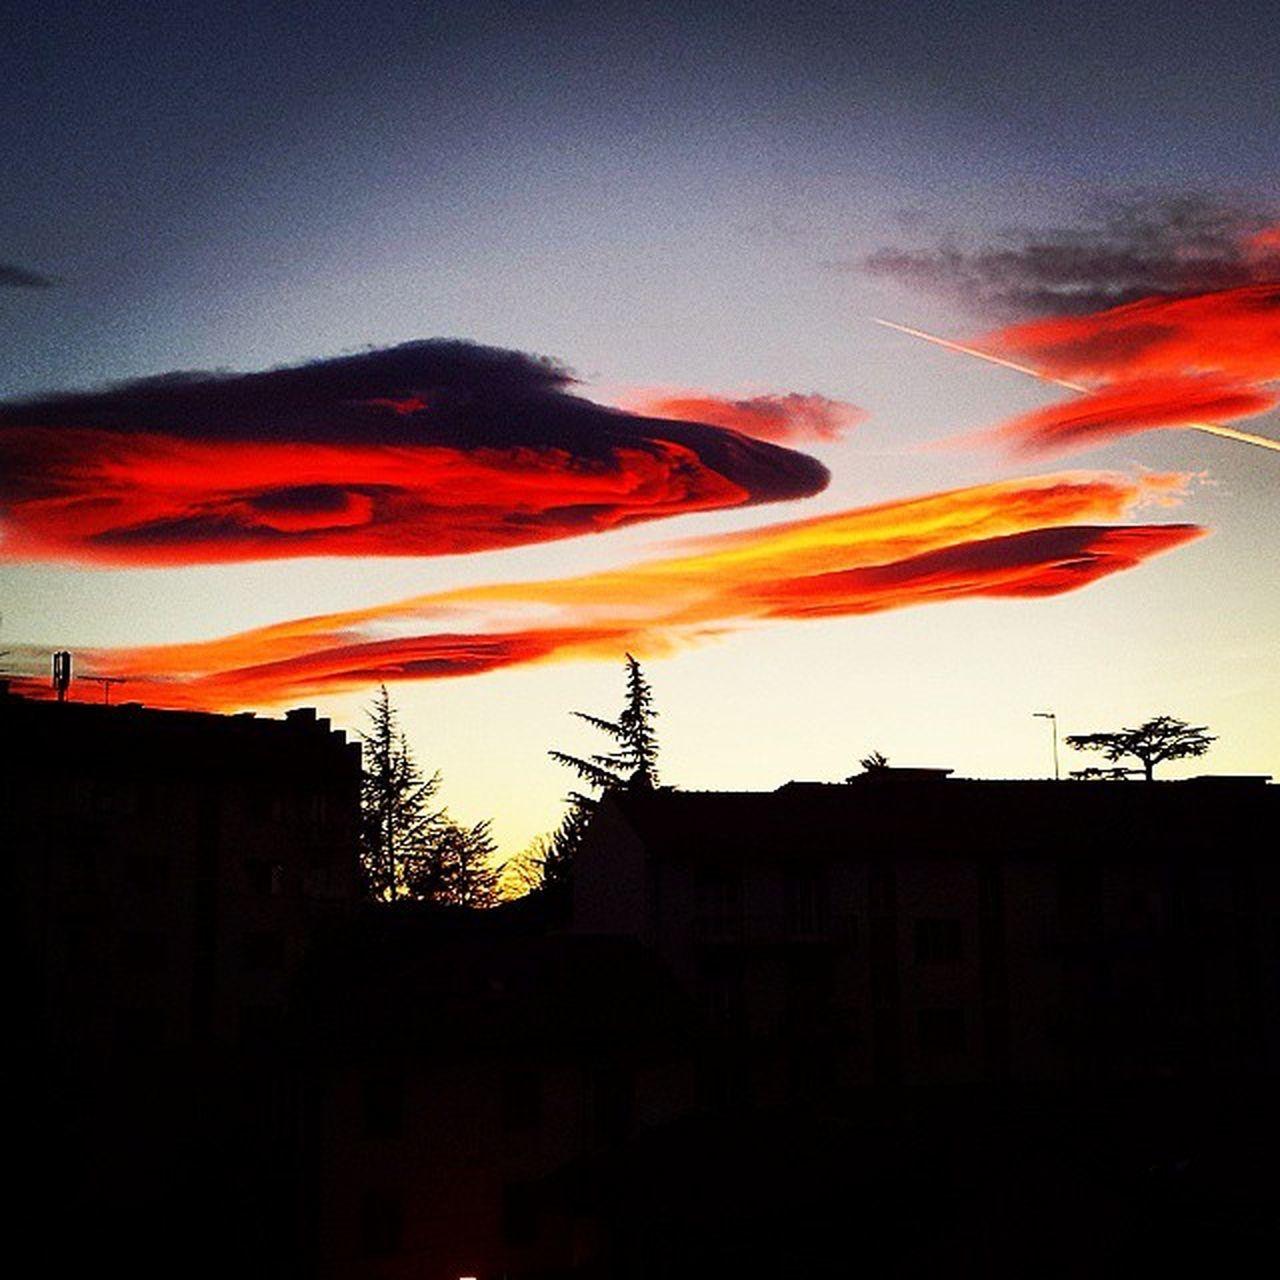 Rivoli Tramonto Luci Sciechimichecherendonorosseevelenoselenuvole Sulvialedeltramontoconladepe Torino Turin Nuvole